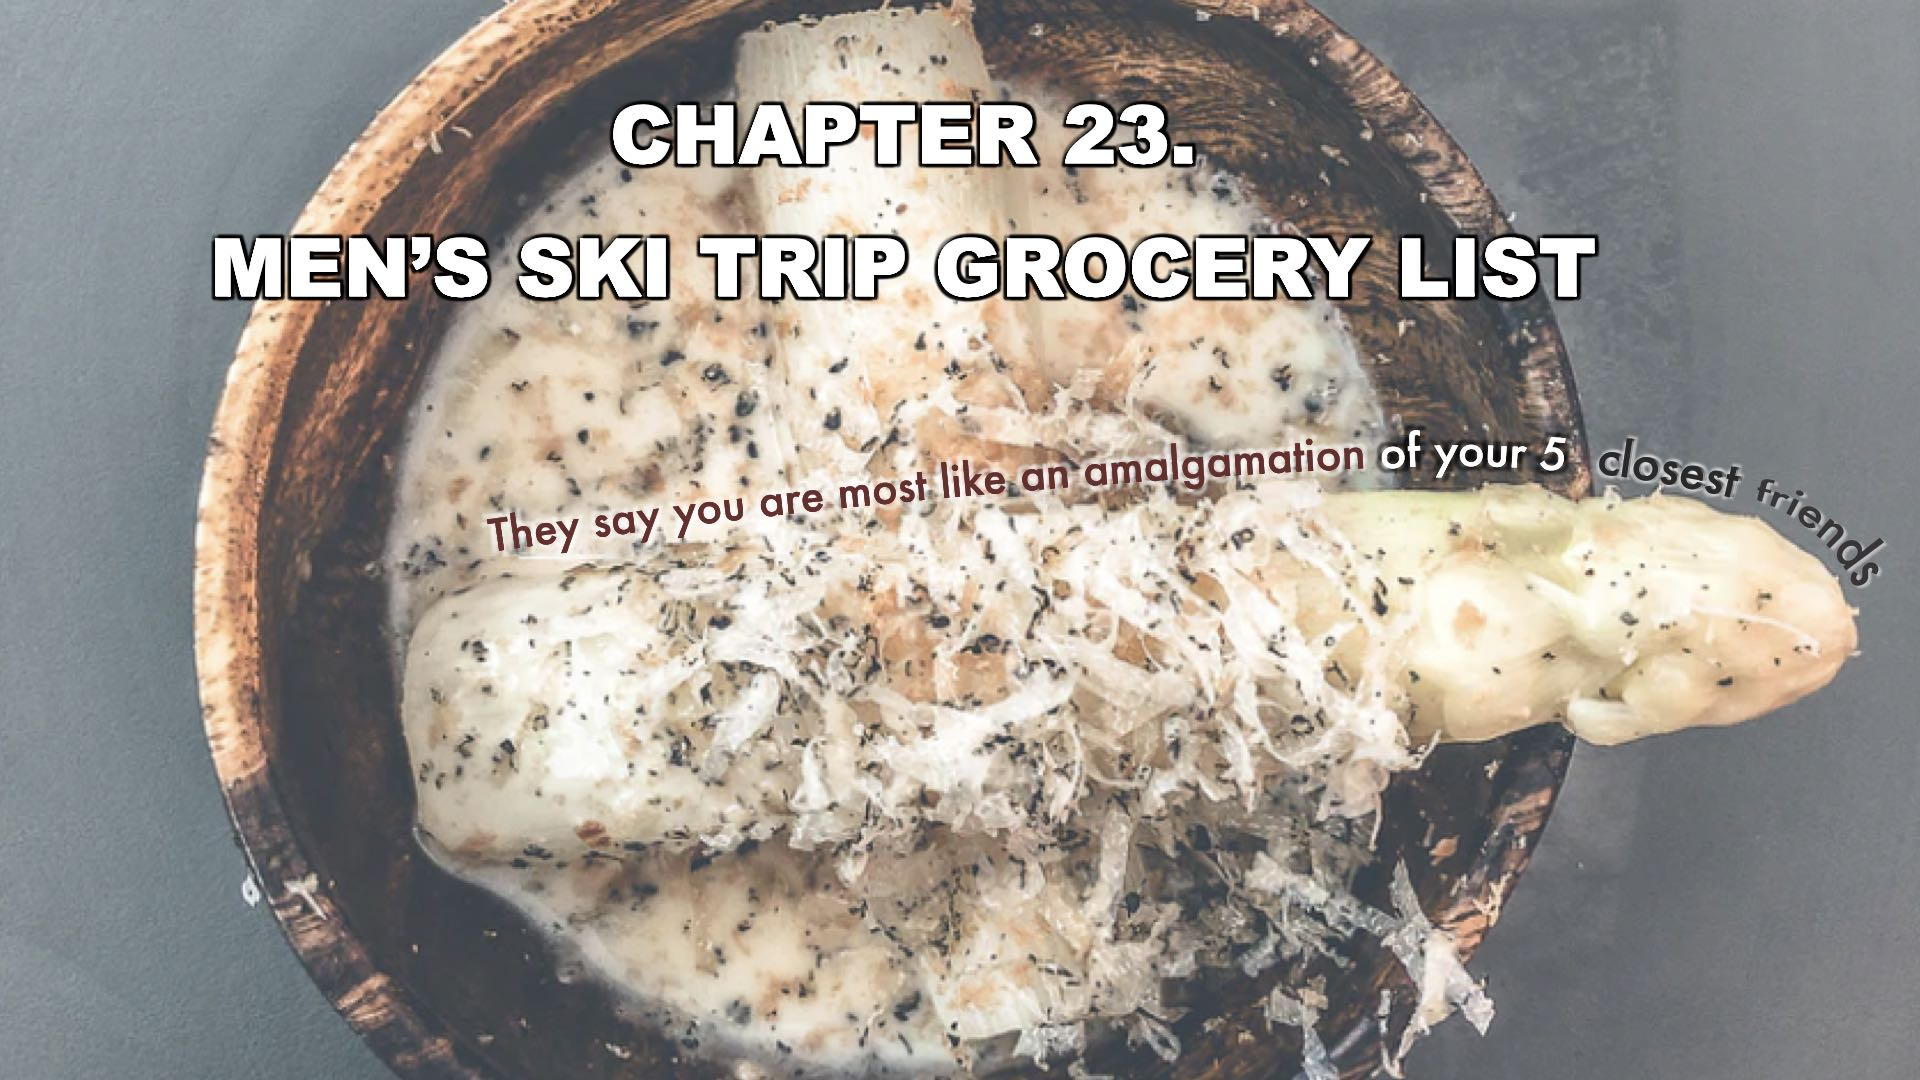 Men's Ski Trip Grocery List